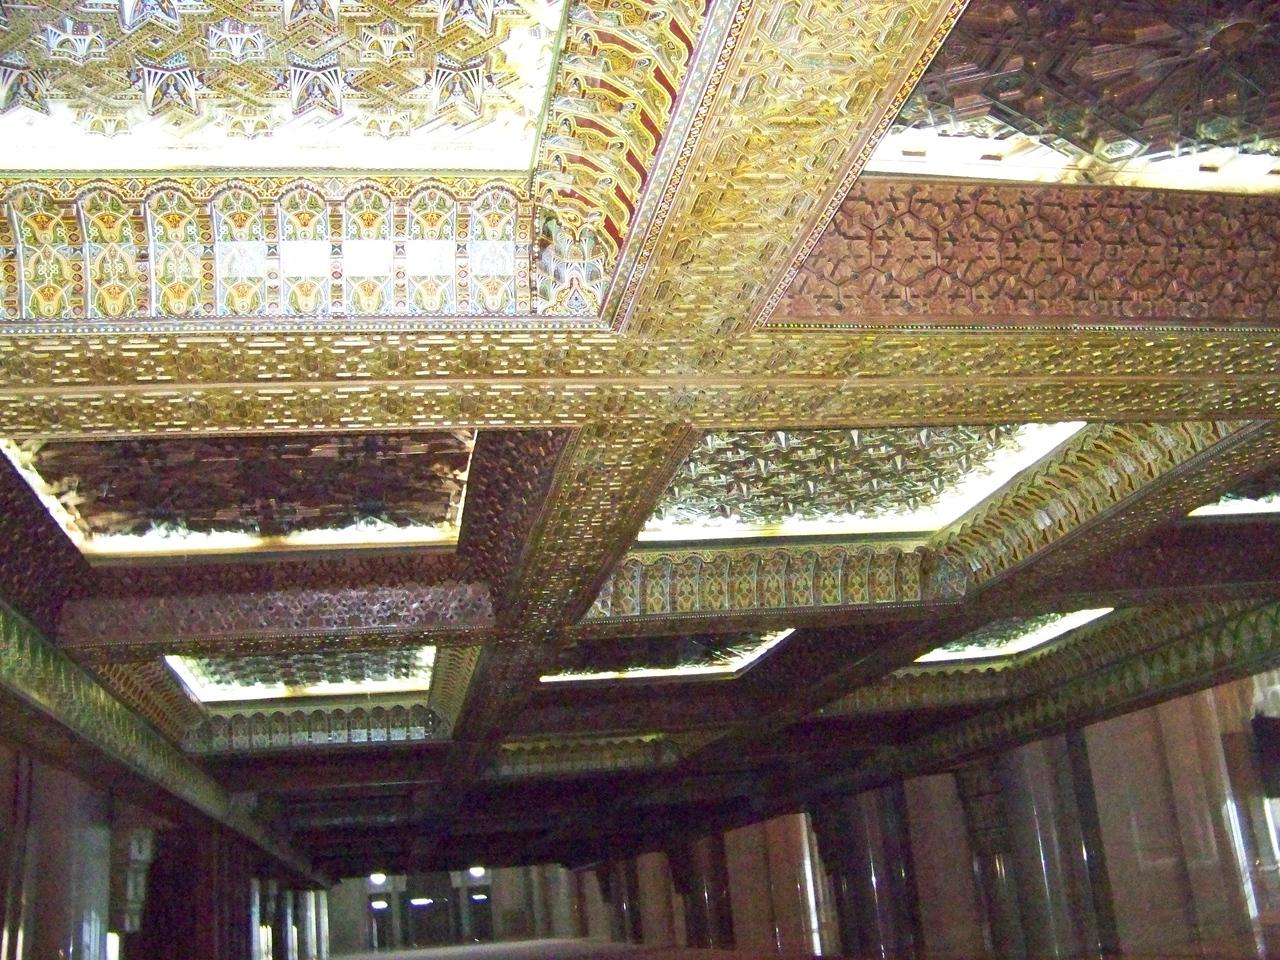 0021 - Hassan II Mosque - Casablanca Morocco.JPG